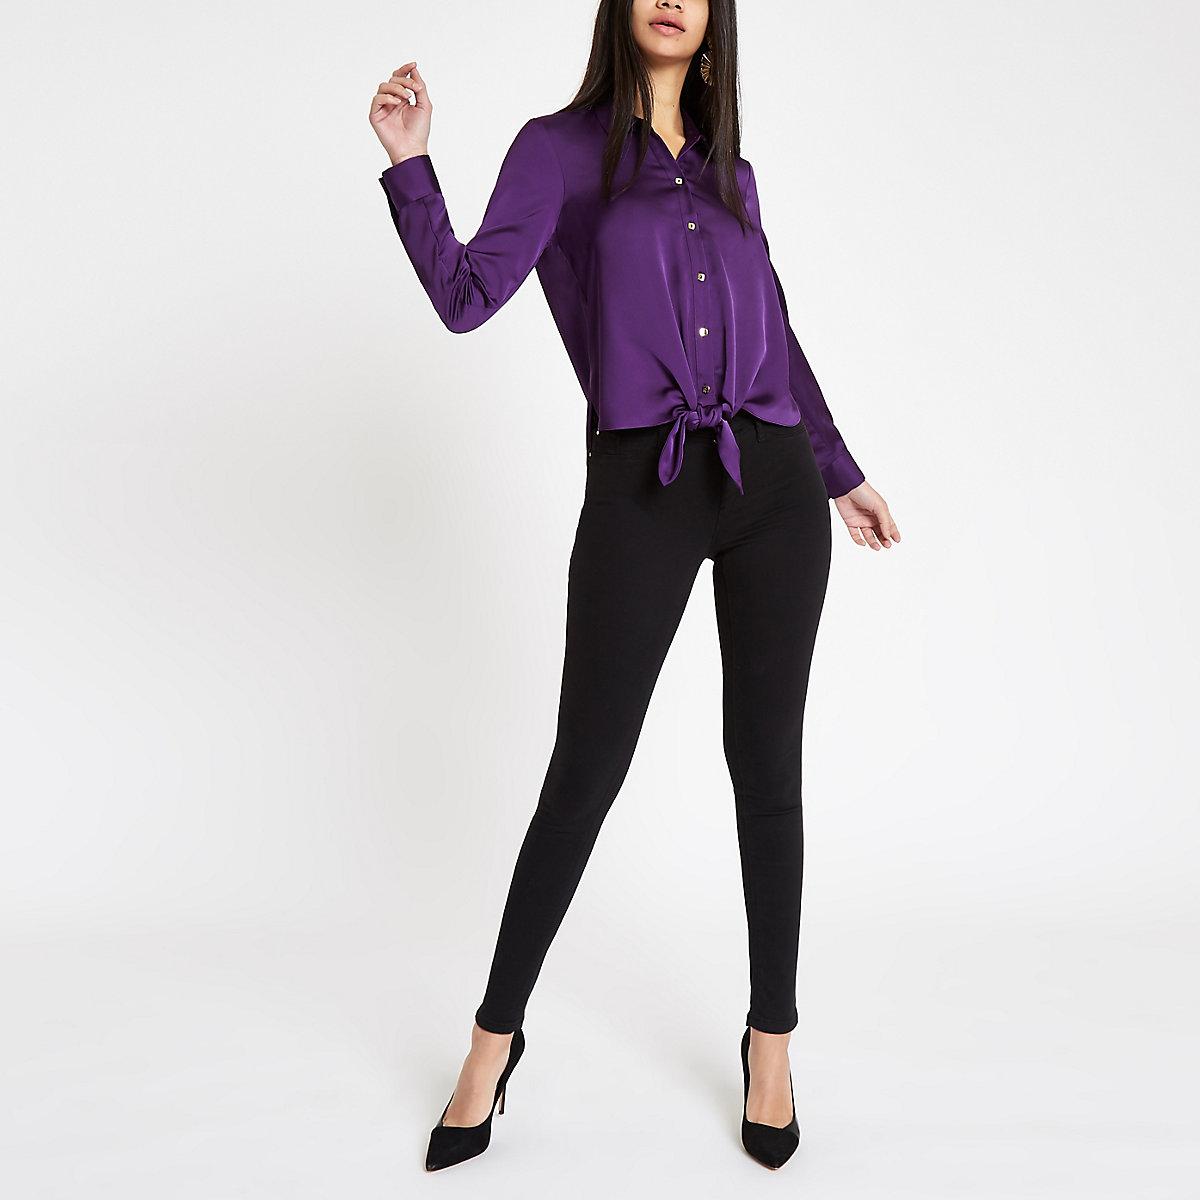 Purple tie front button-up shirt